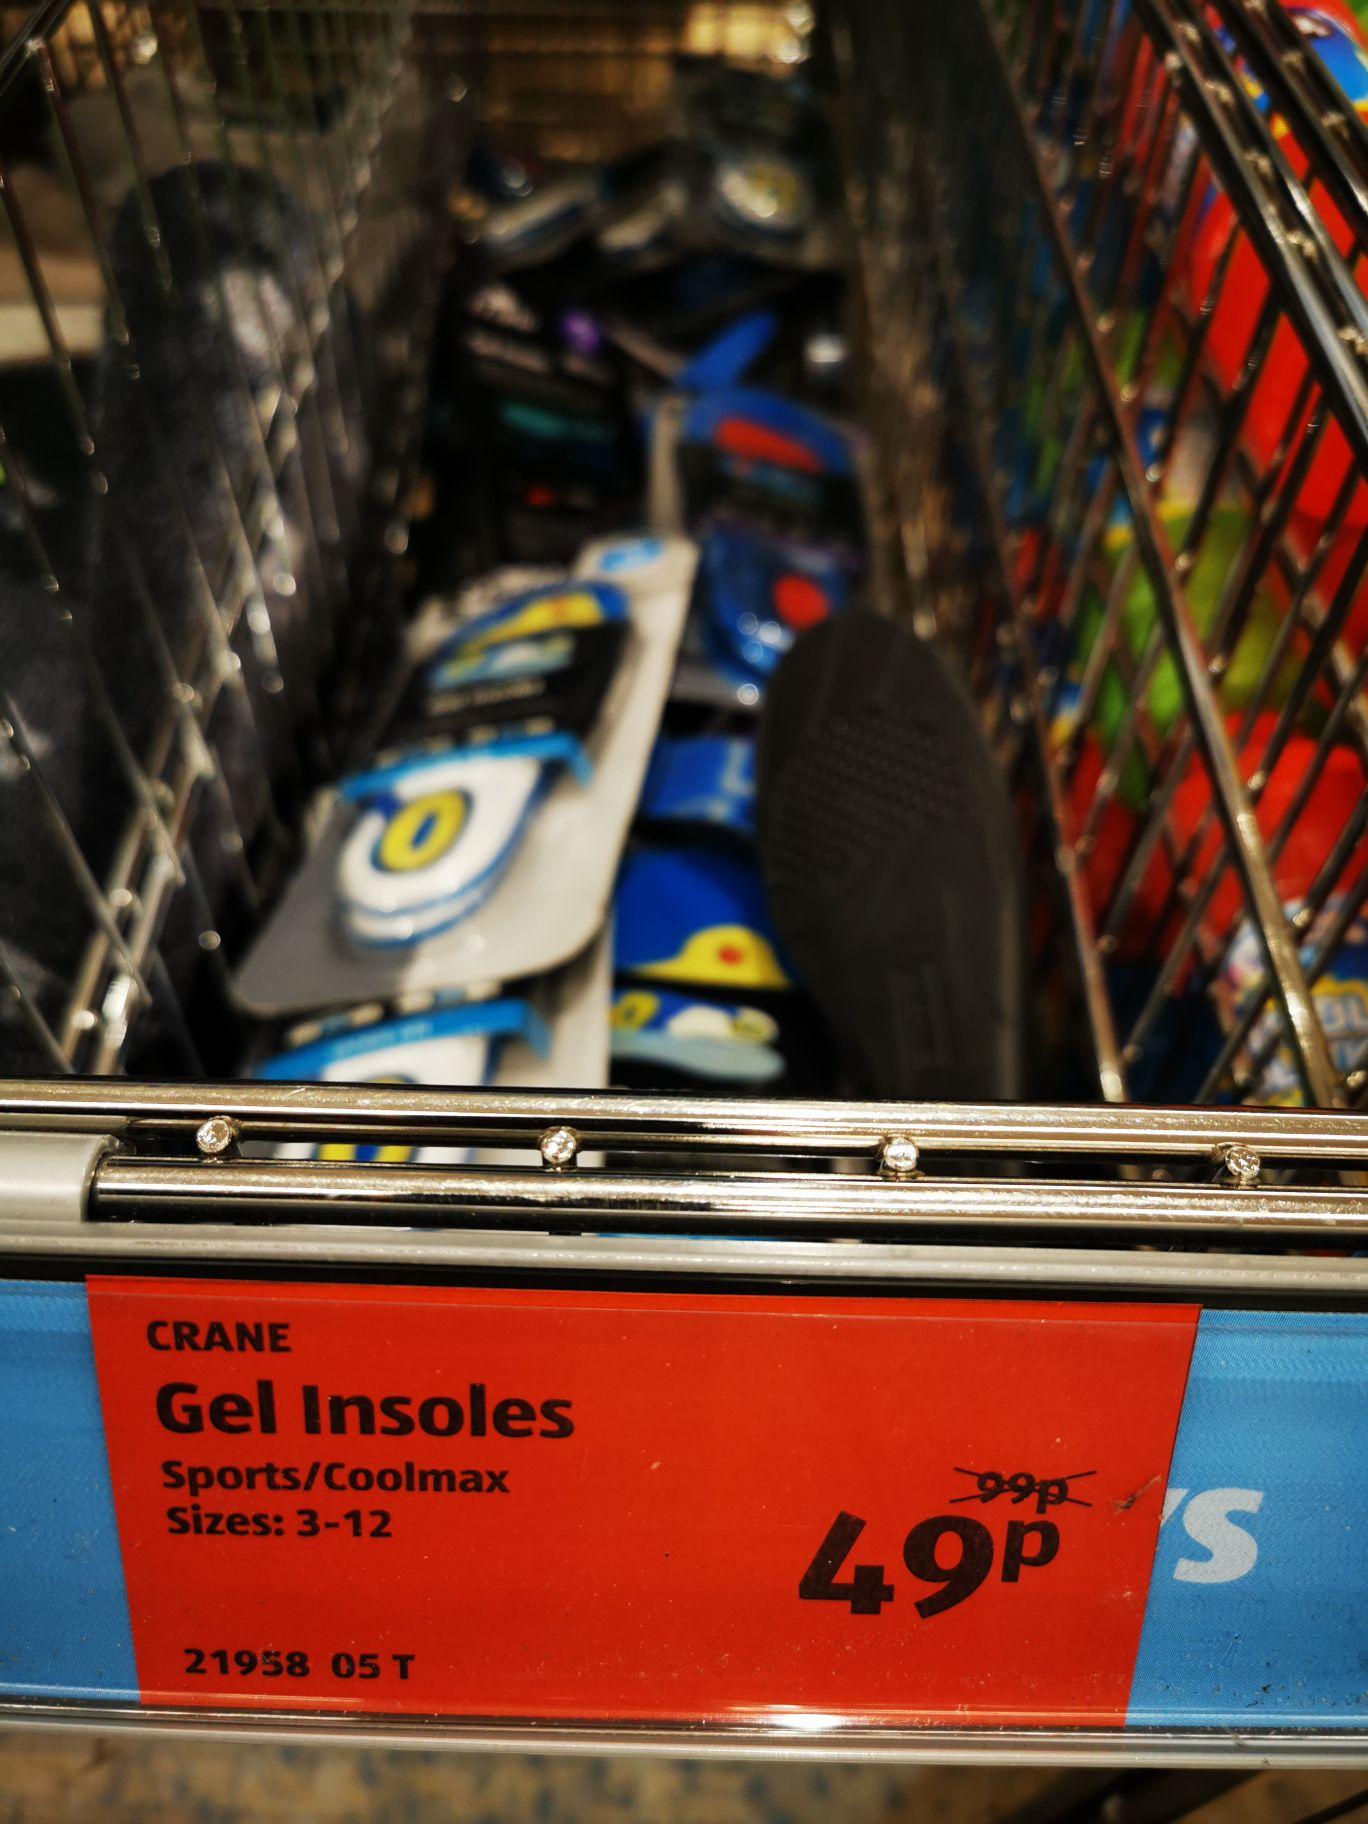 Crane gel insoles £0.49 at Aldi, Swindon, Wiltshire